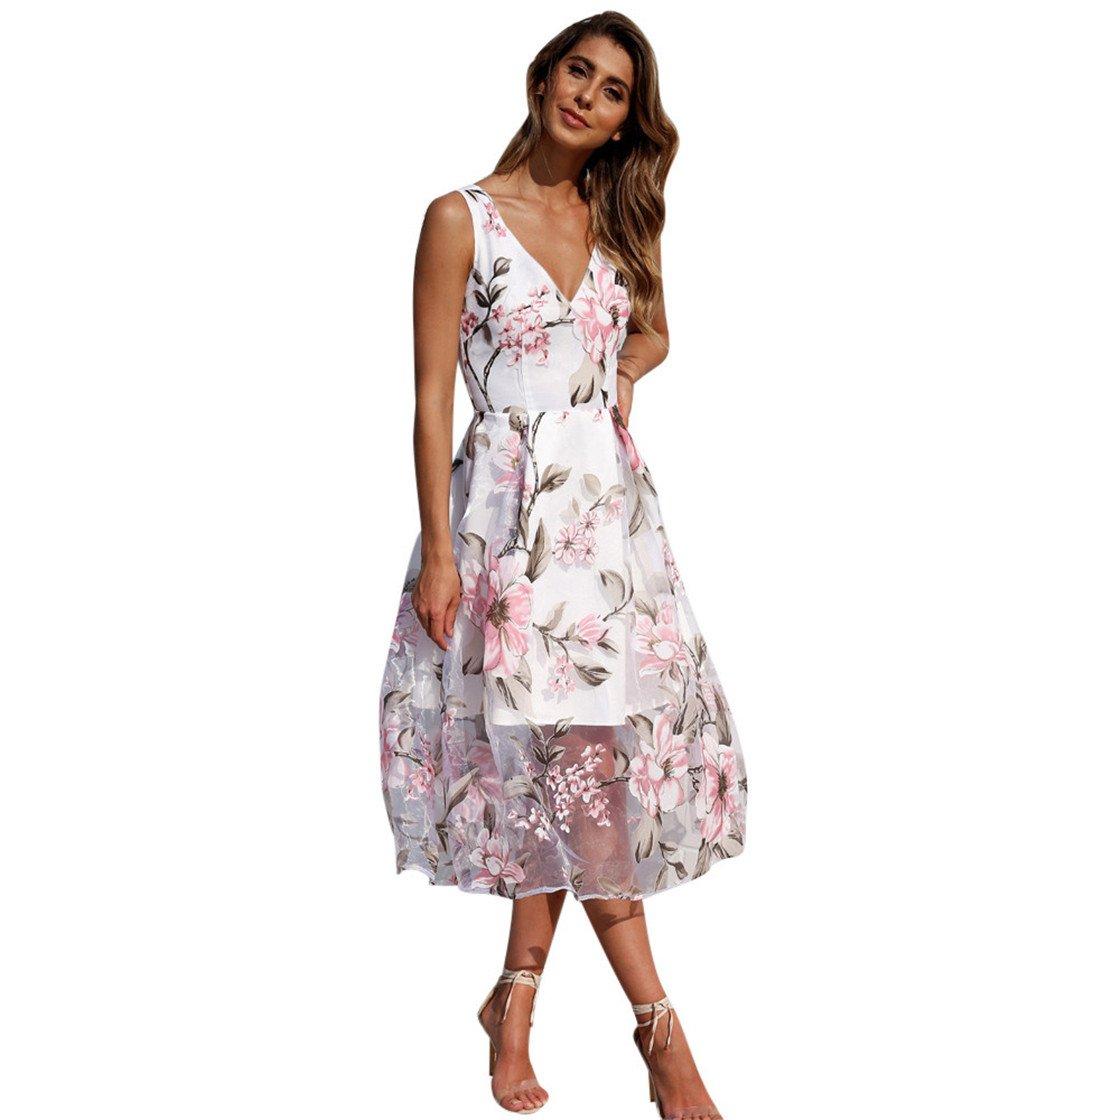 Mose Long Maxi Dresses for Women, Women's Sleeveless Floral Print Mesh Fashion Beauty Elegant Tops Bohemian Casual Mini Dress New (L, White)